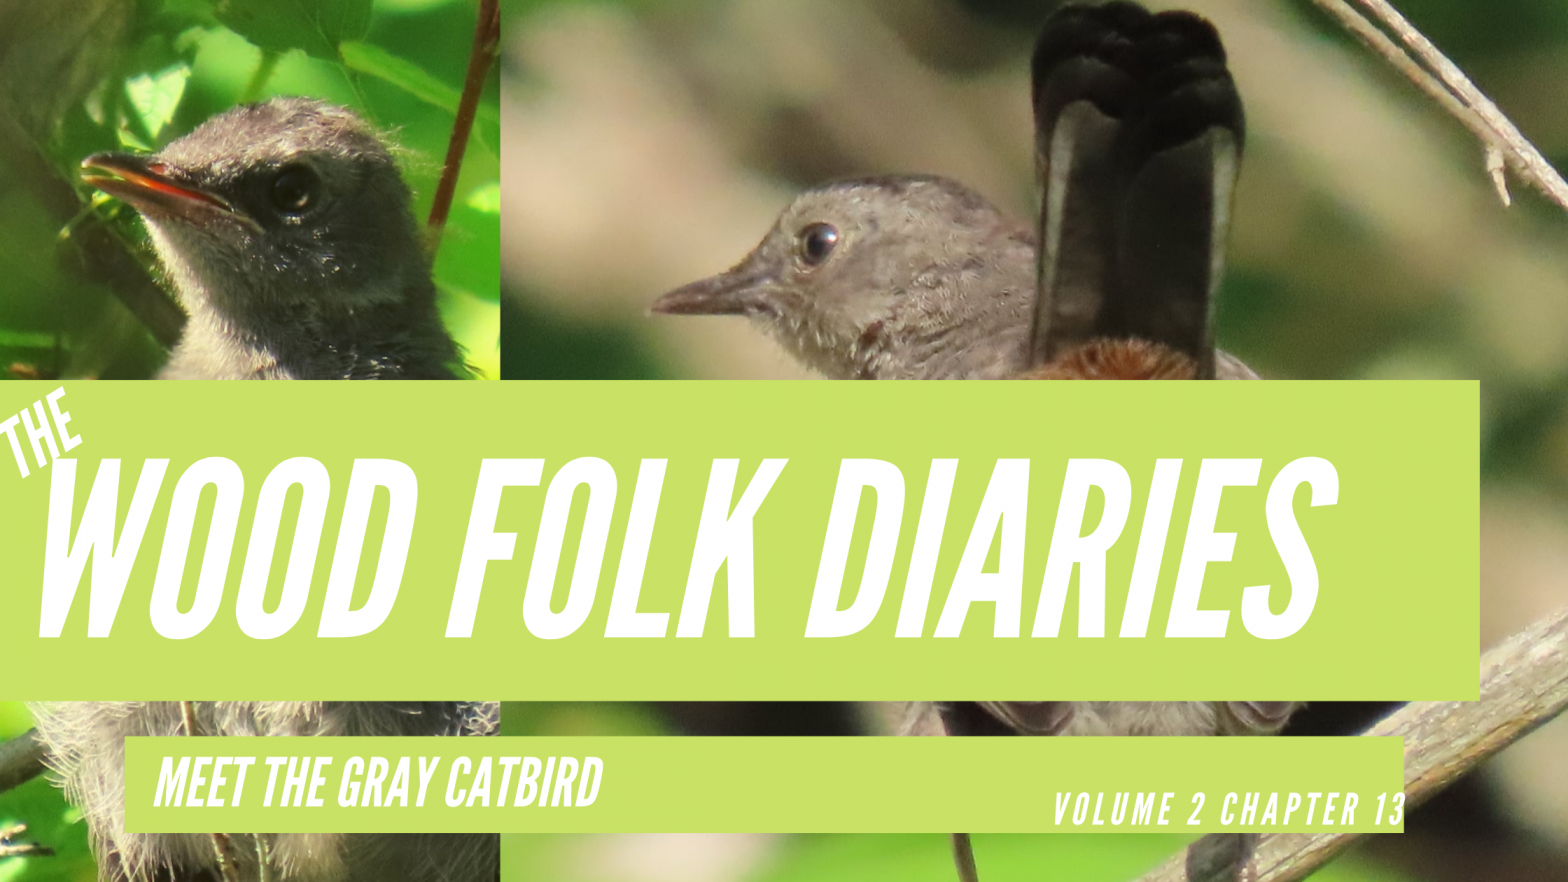 The Wood Folk Diaries: Volume 2, Chapter 13: Meet the Gray Catbird